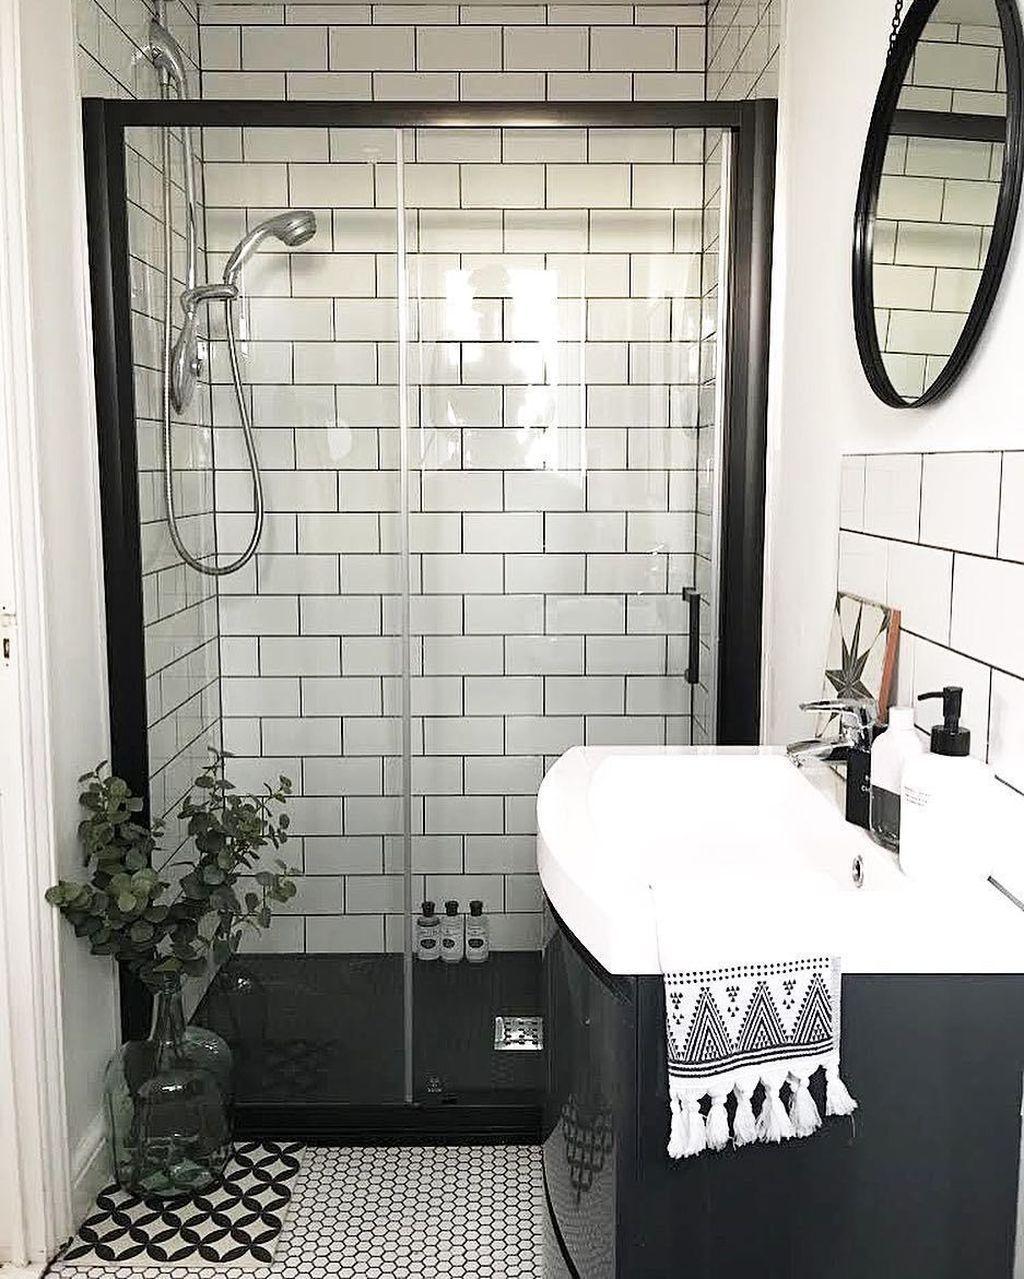 35 Inspiring Unique Bathroom Ideas That You Should Try In 2020 Small Bathroom Bathrooms Remodel Bathroom Remodel Master